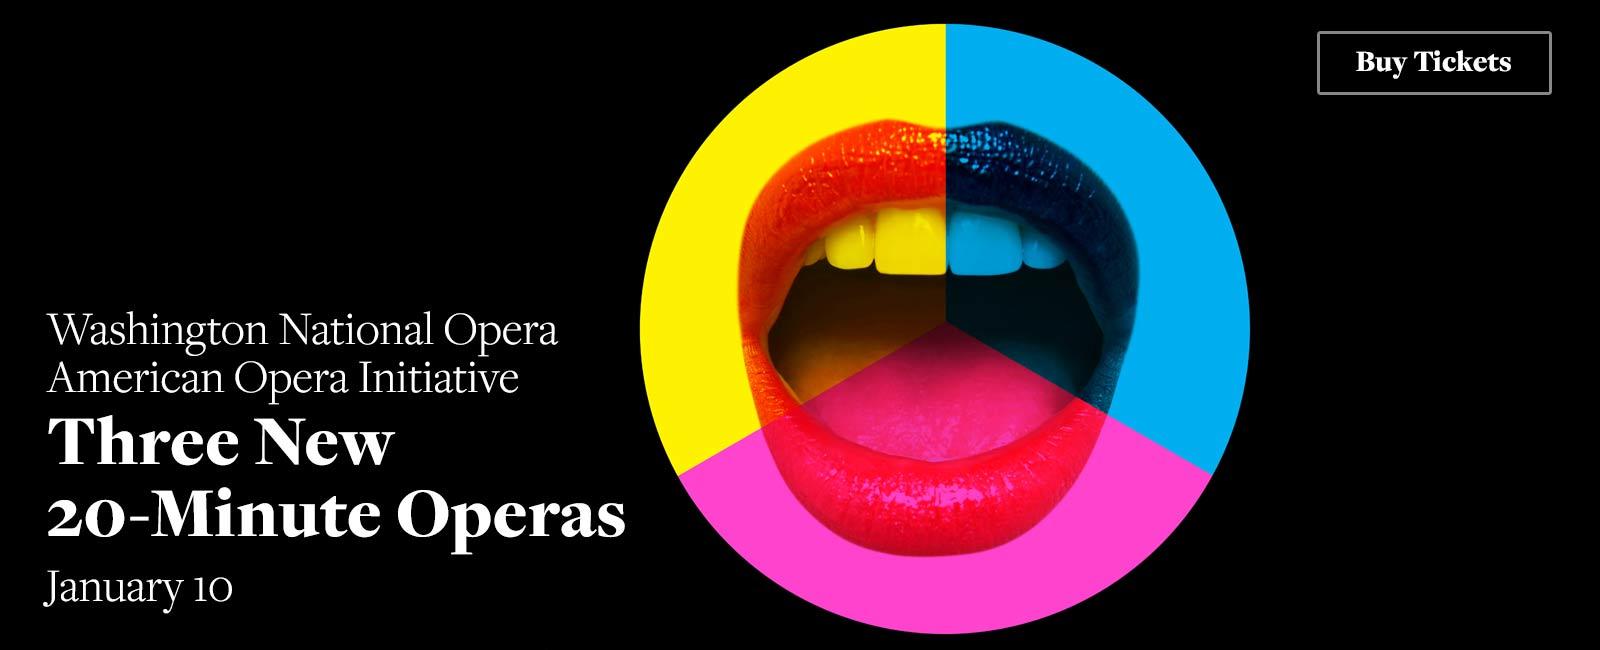 Three New 20-Minute Operas